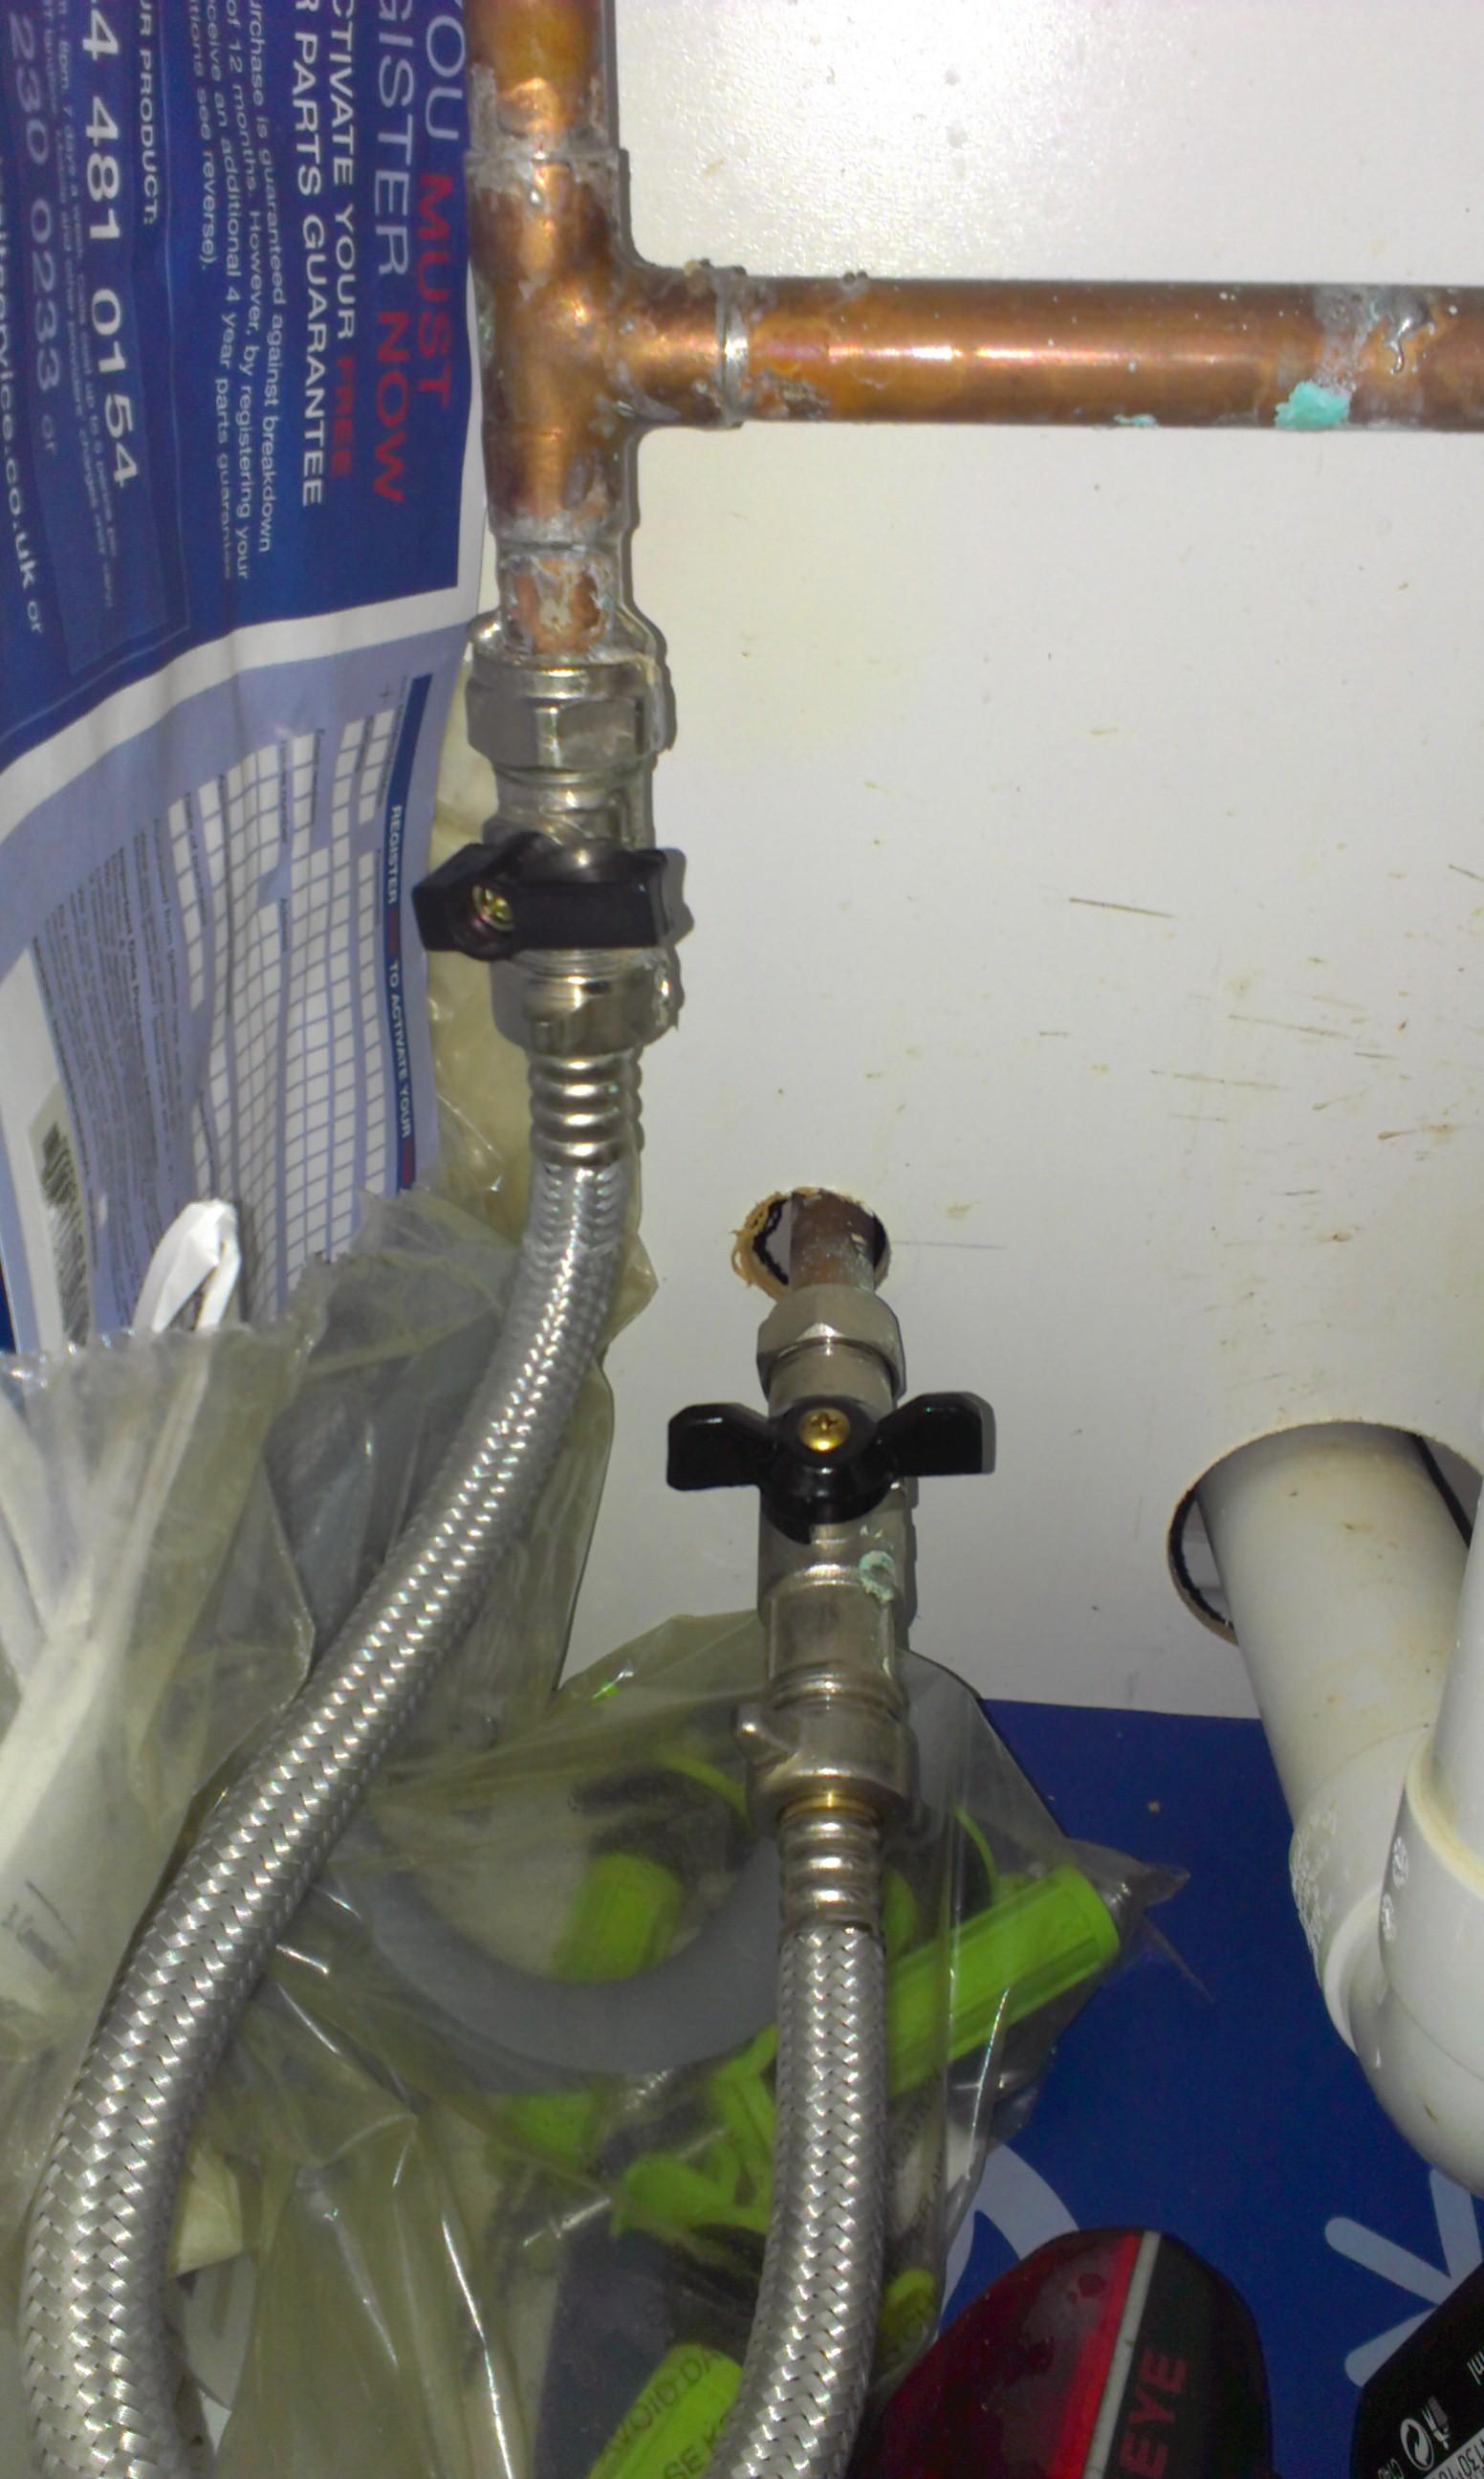 I have a Potterton promax combi 33 HE A boiler. This morning I woke ...